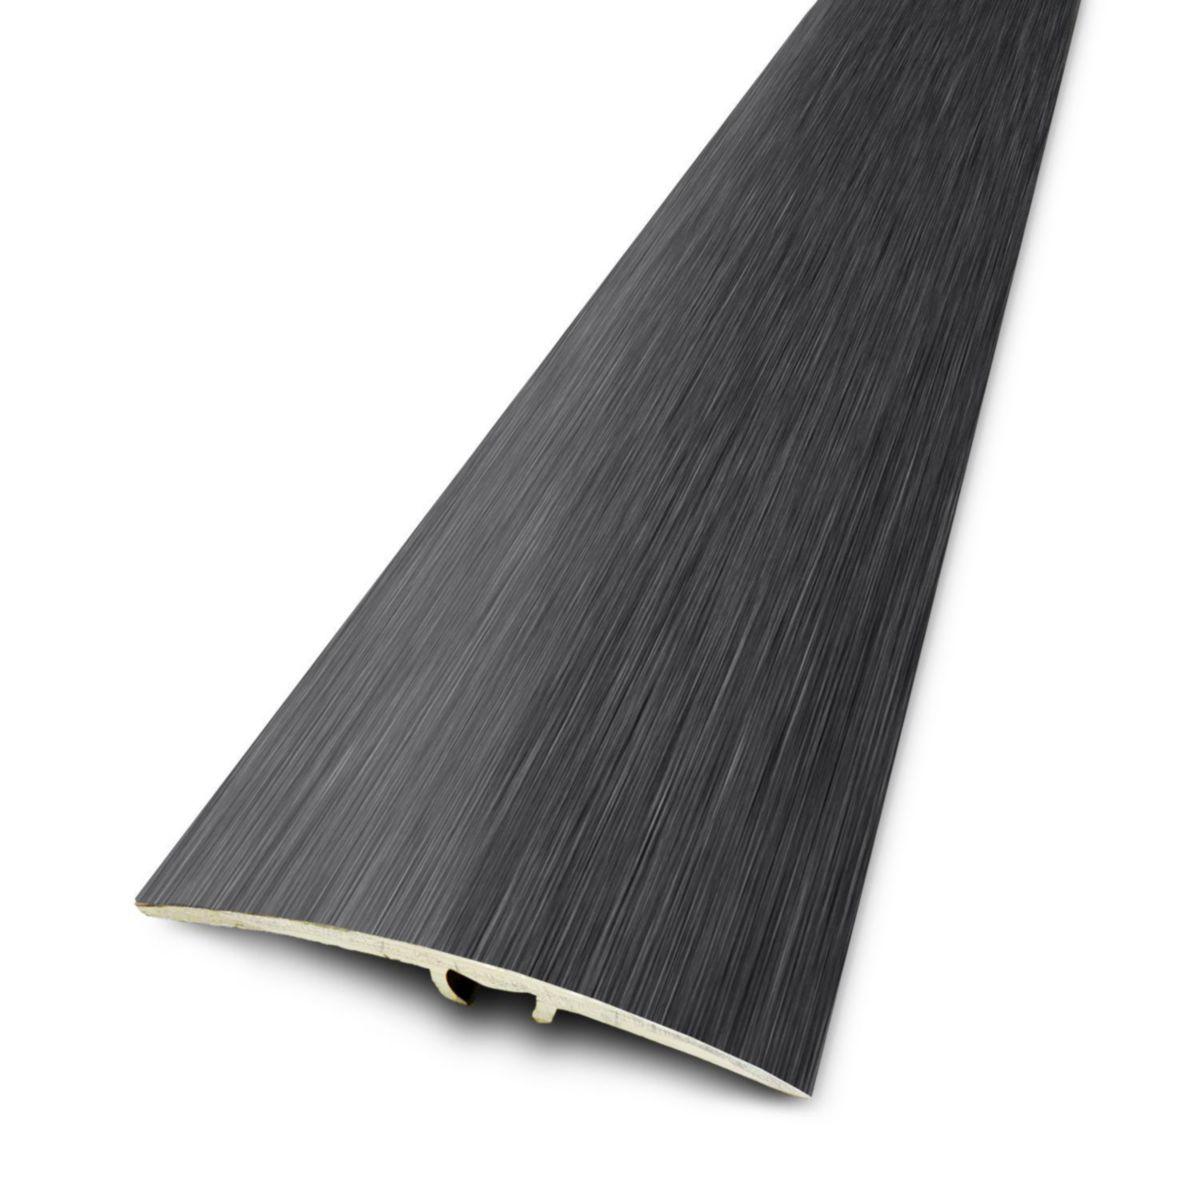 barre de seuil porte de garage cheap barre de seuil porte garage dimension with barre de seuil. Black Bedroom Furniture Sets. Home Design Ideas